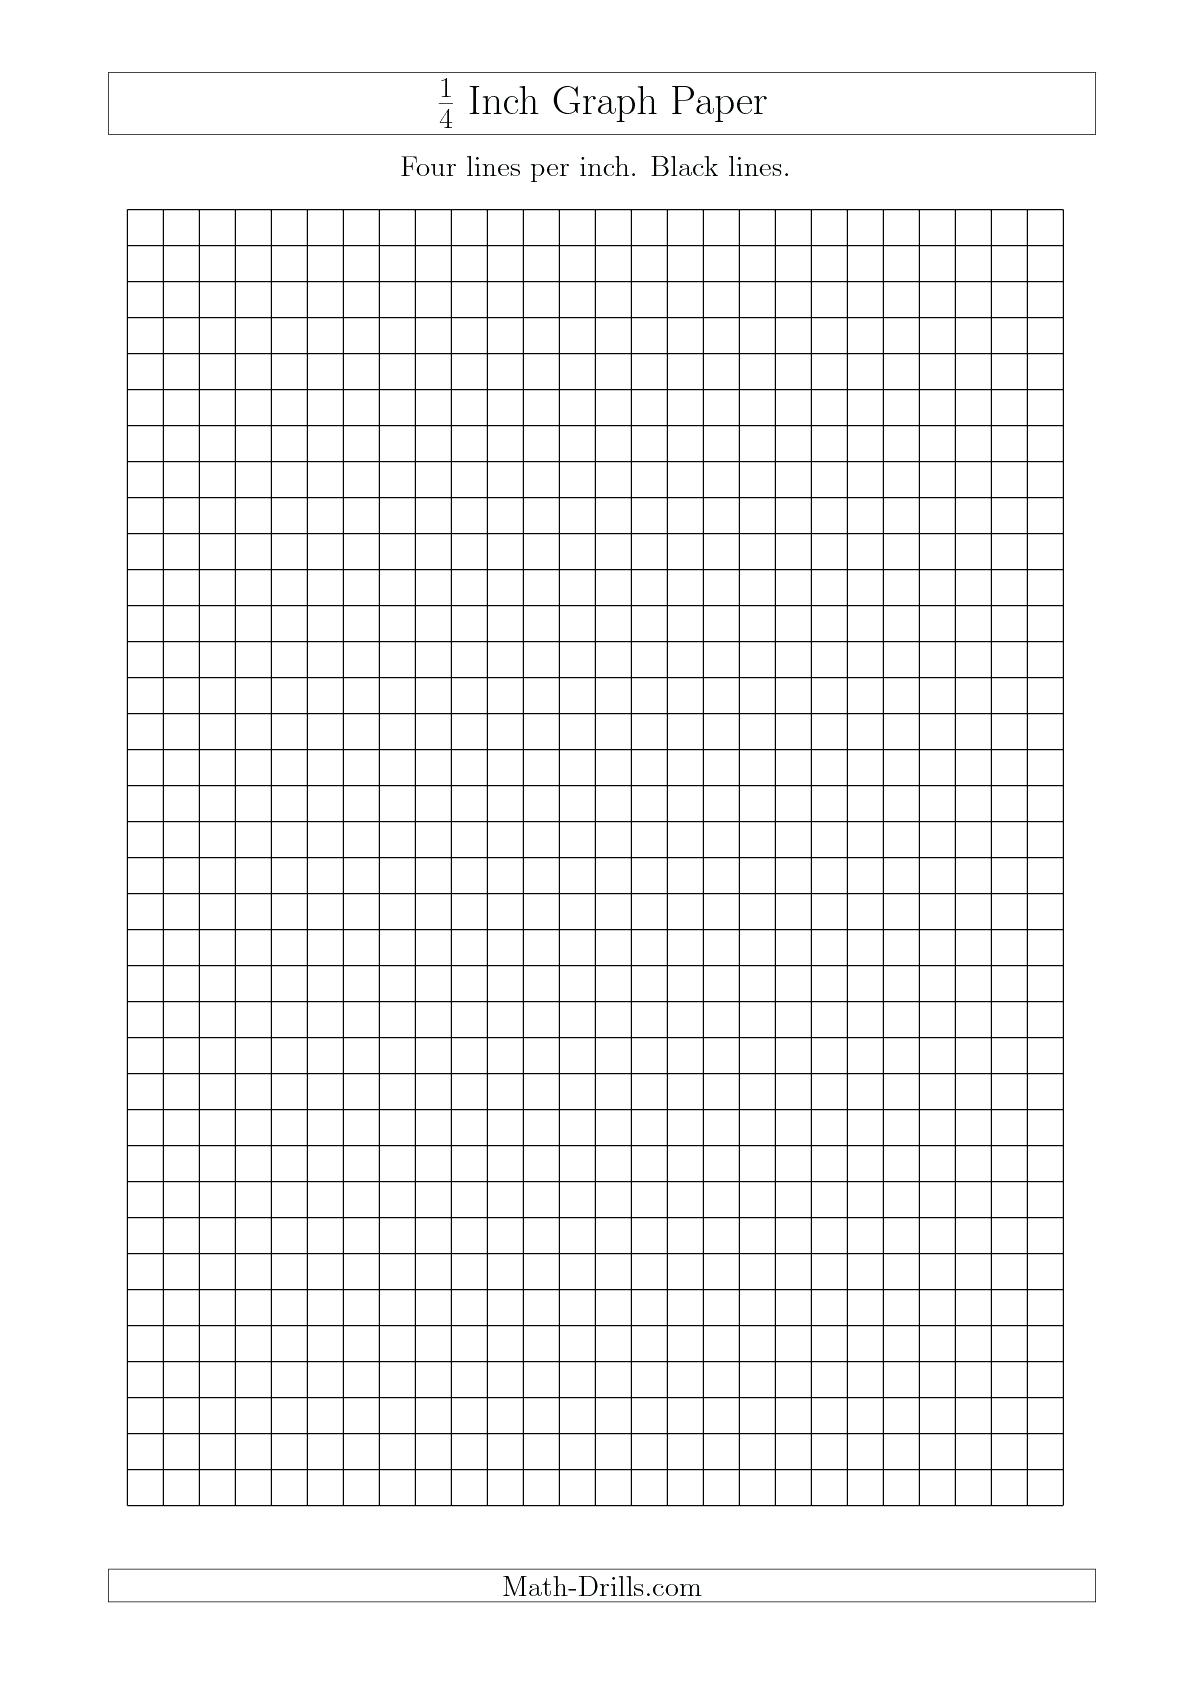 Printable Graph Paper 1 4 Inch Math 1 4 Grid Paper Printable Print - Free Printable Graph Paper 1 4 Inch